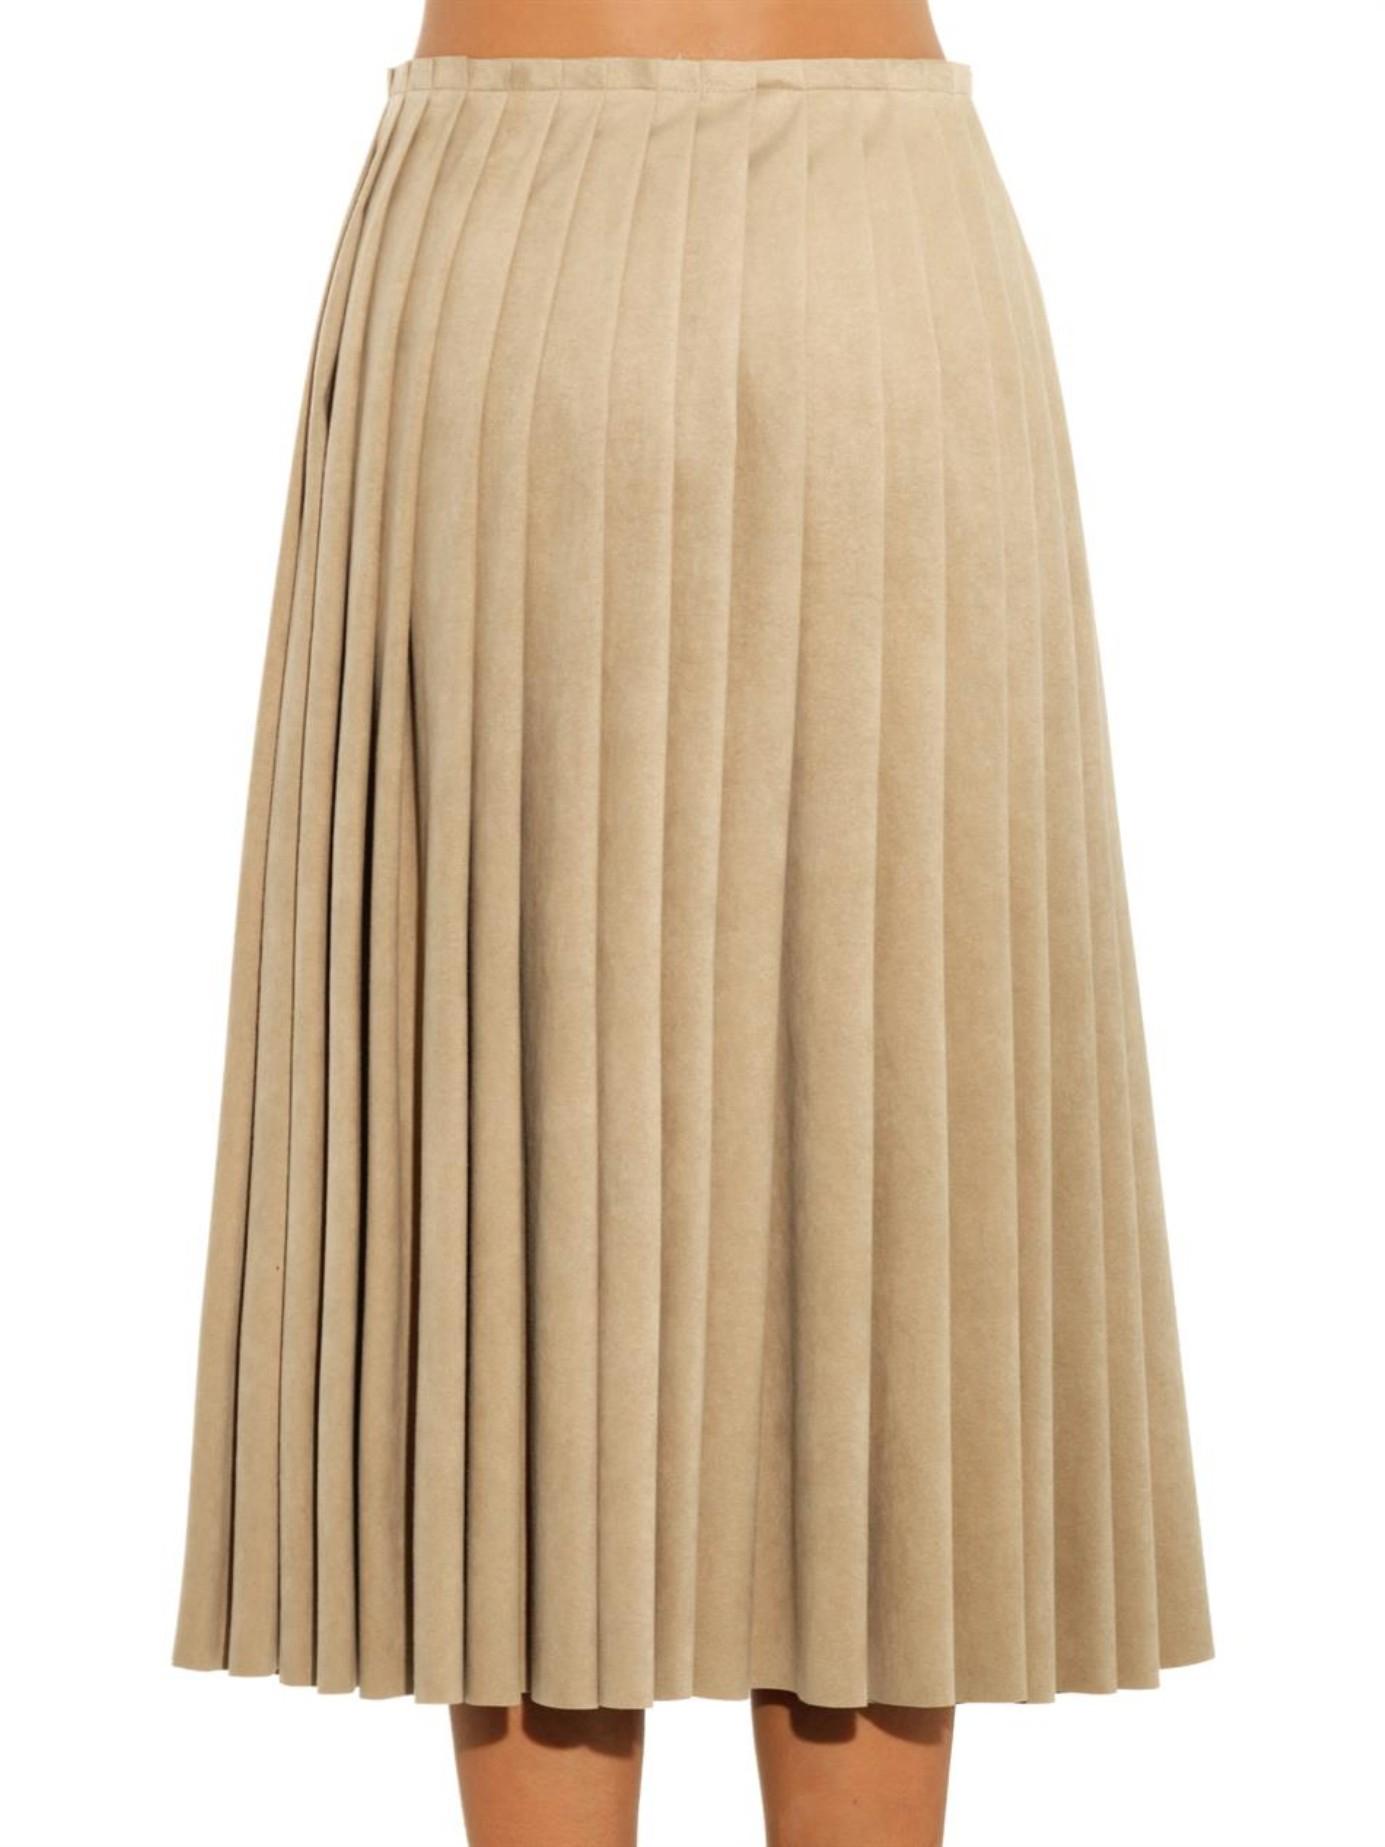 Acne studios Kensington Faux-Suede Pleated Skirt in ...